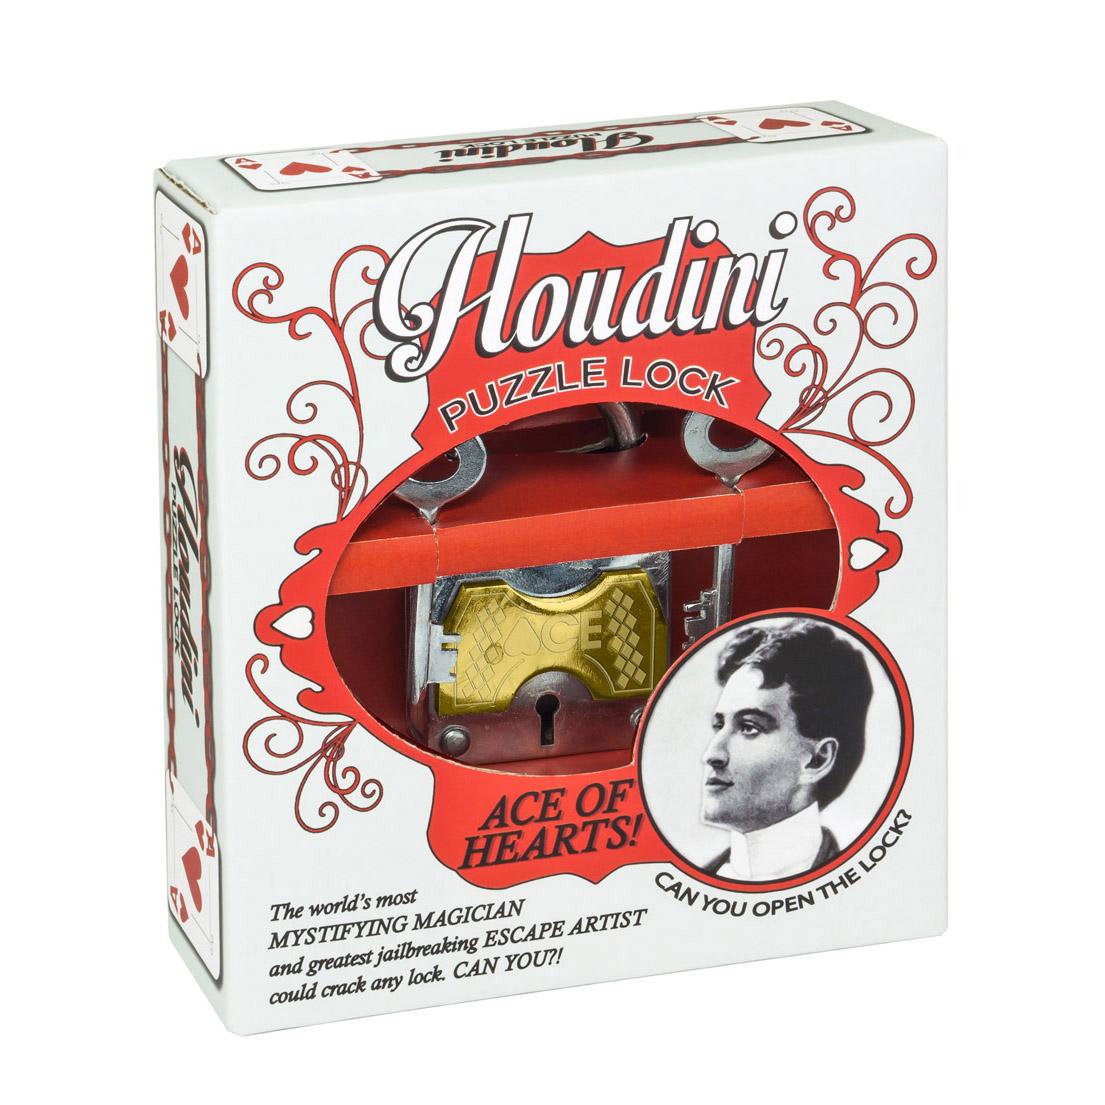 1068 - Houdini - Ace of Hearts